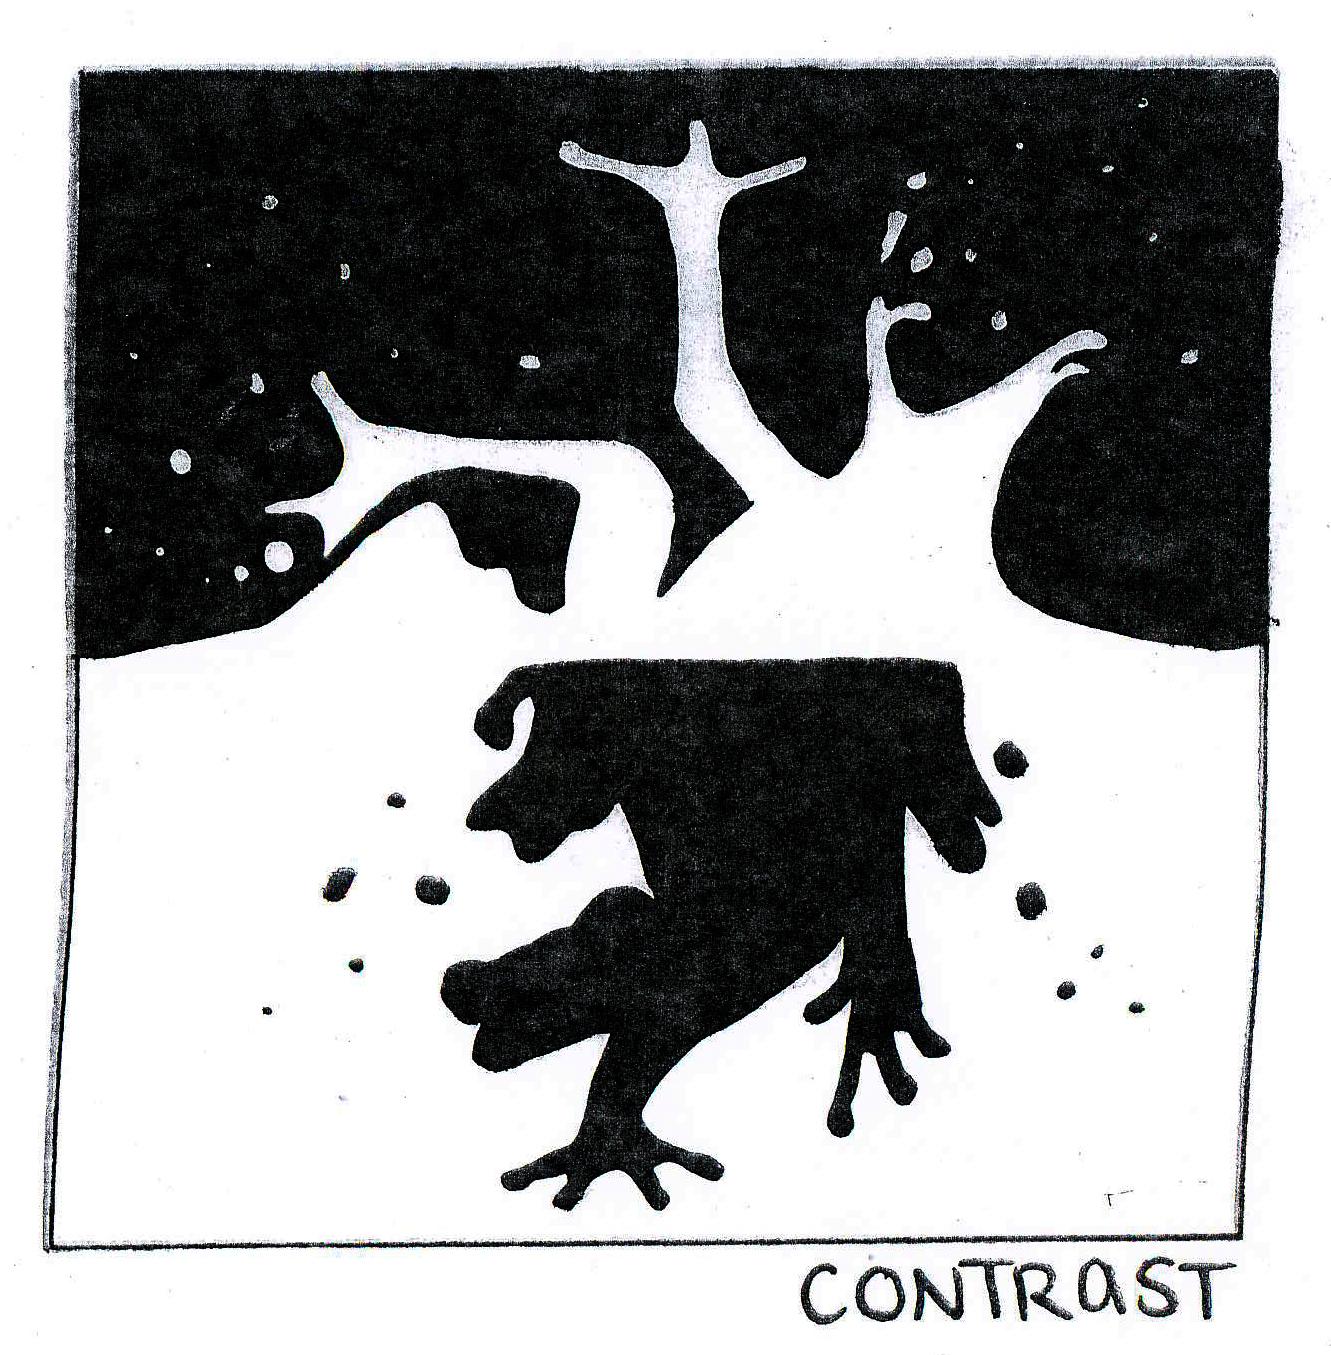 Contrast In Principles Of Design : Visual communication resource design principle contrast